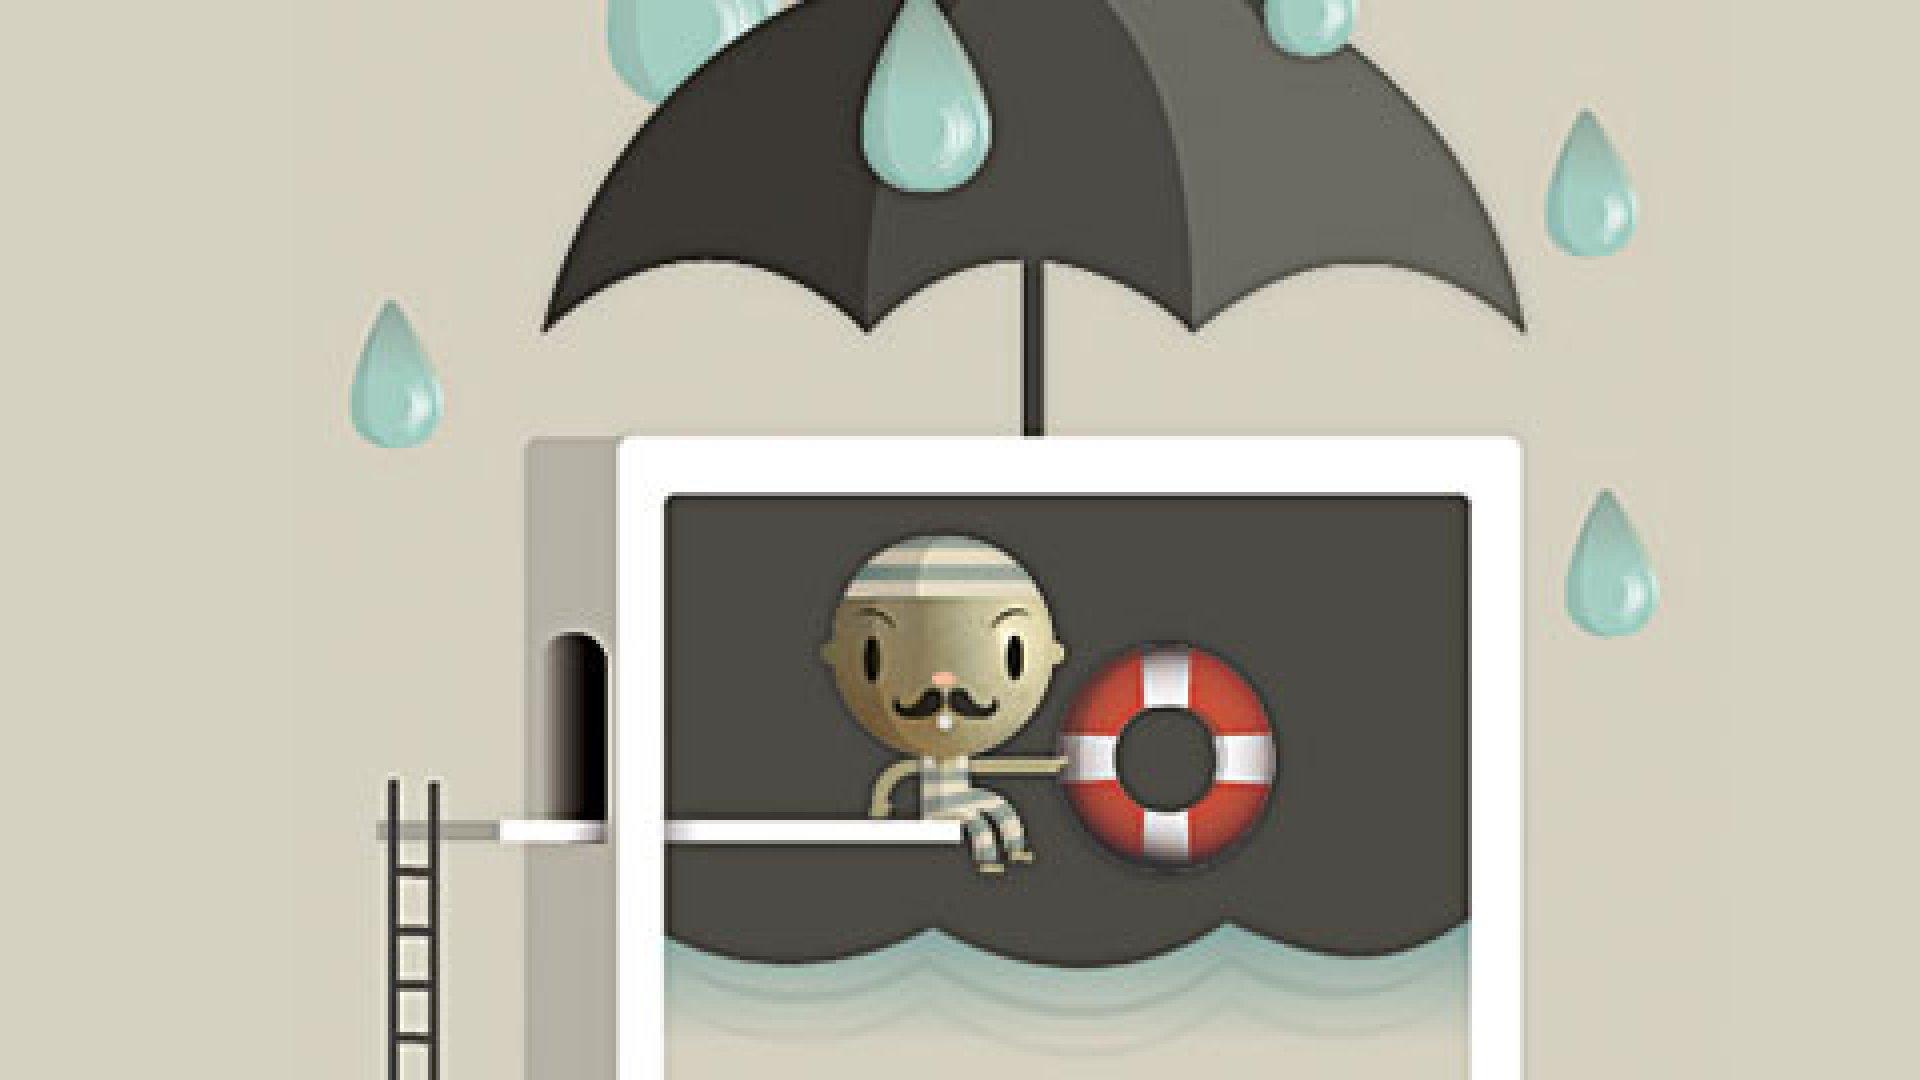 Security: Free Antivirus Software